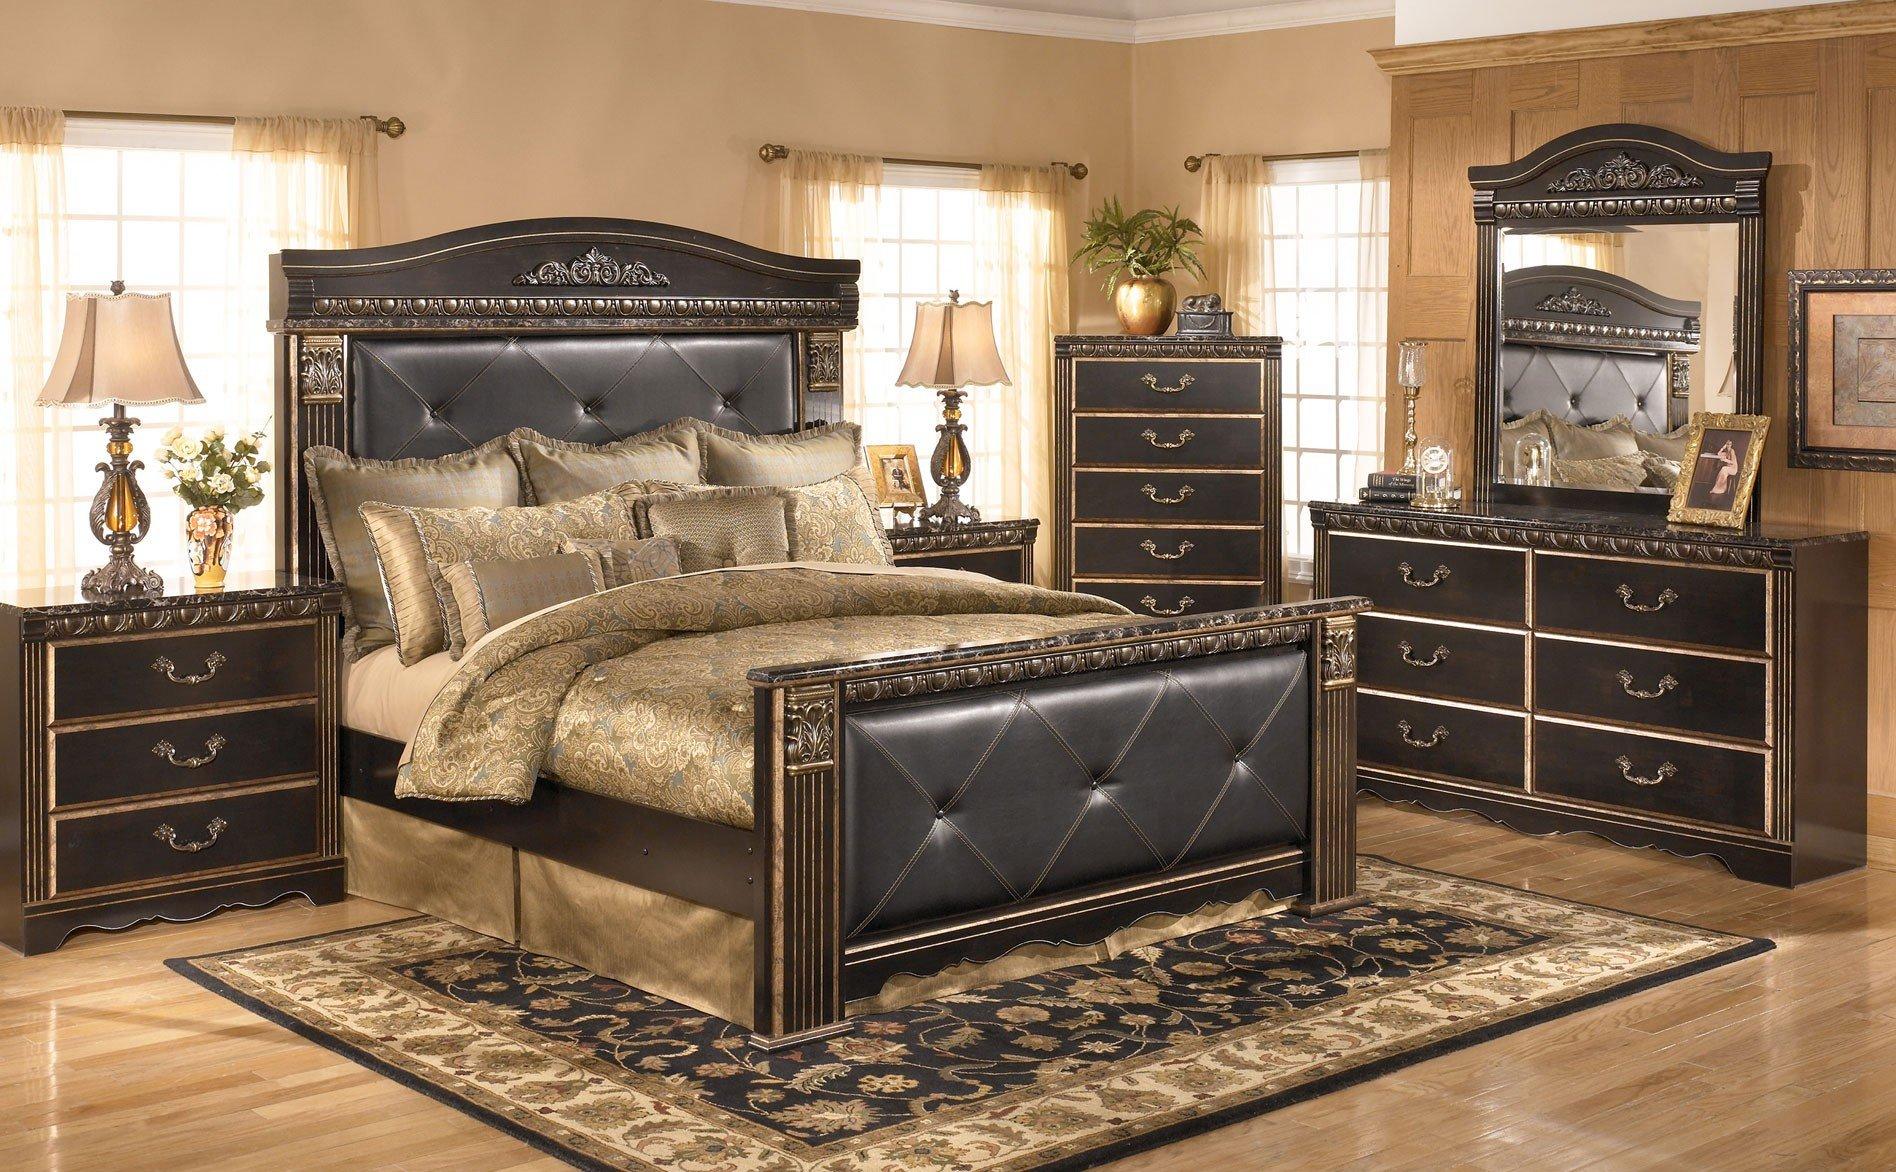 Coal Creek Bedroom Set Elegant Furniture Captivating Bobs Furniture Clearance and Cozy